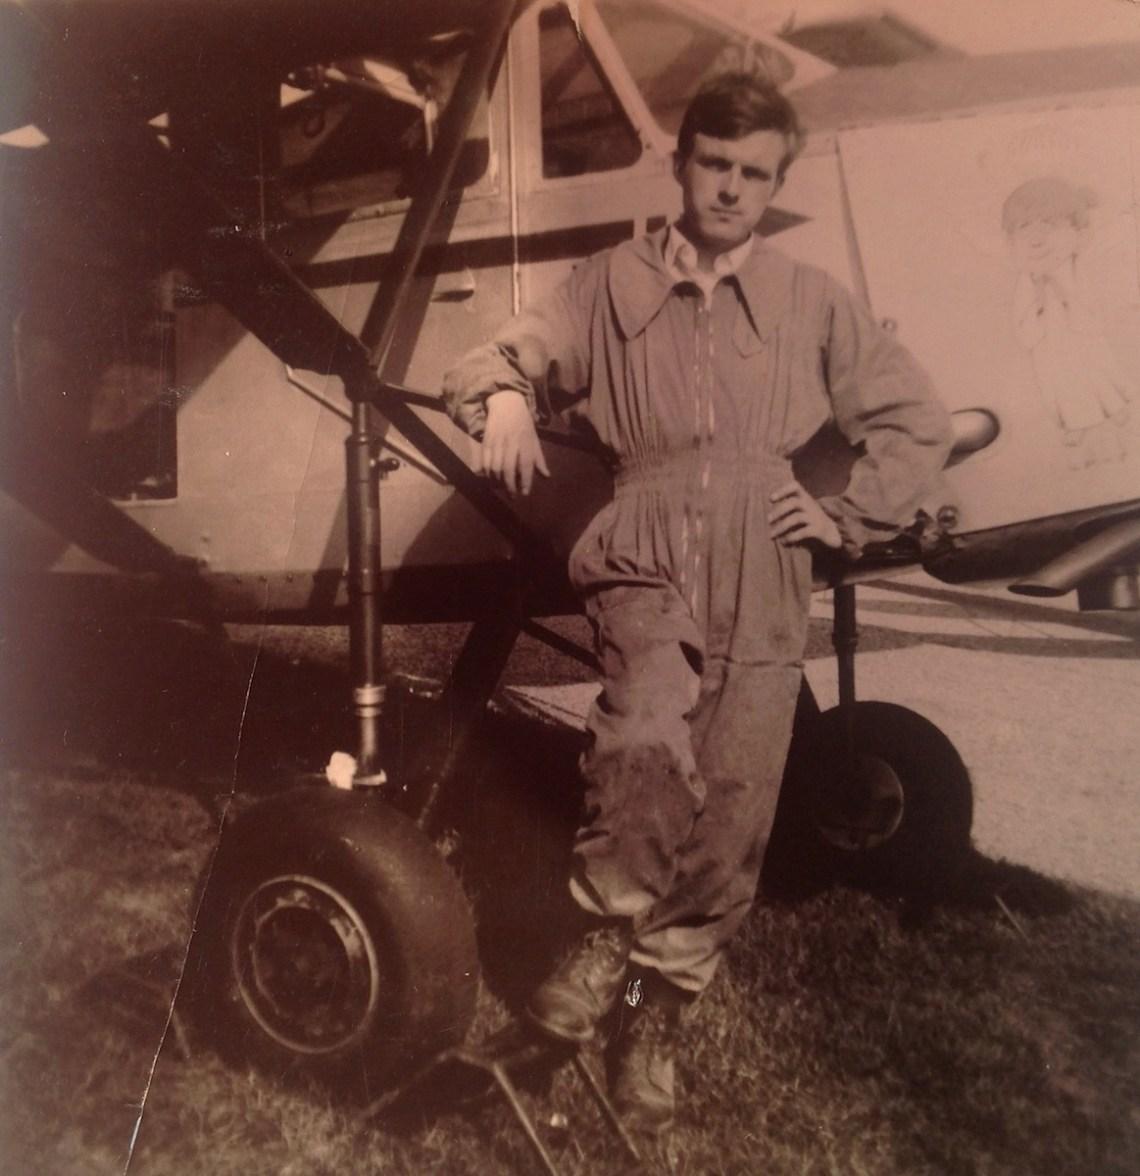 David Lebloas parachutiste devant la Caudron Phalène de l'ACN en 1964 @David Lebloas